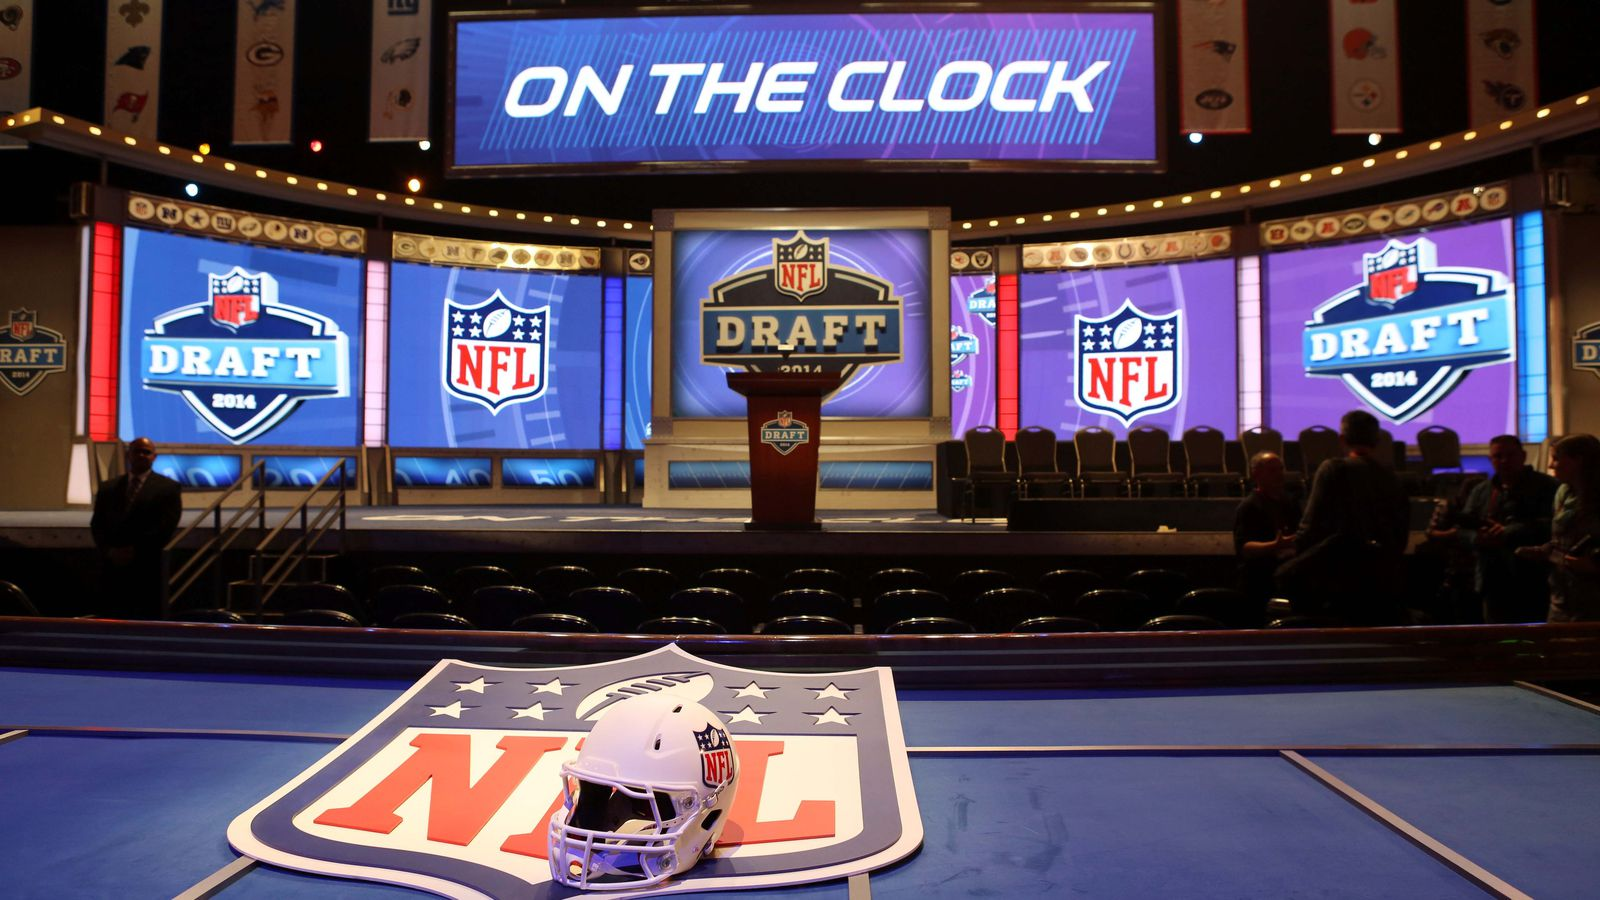 2014 NFL选秀:第一轮获得最高收视率